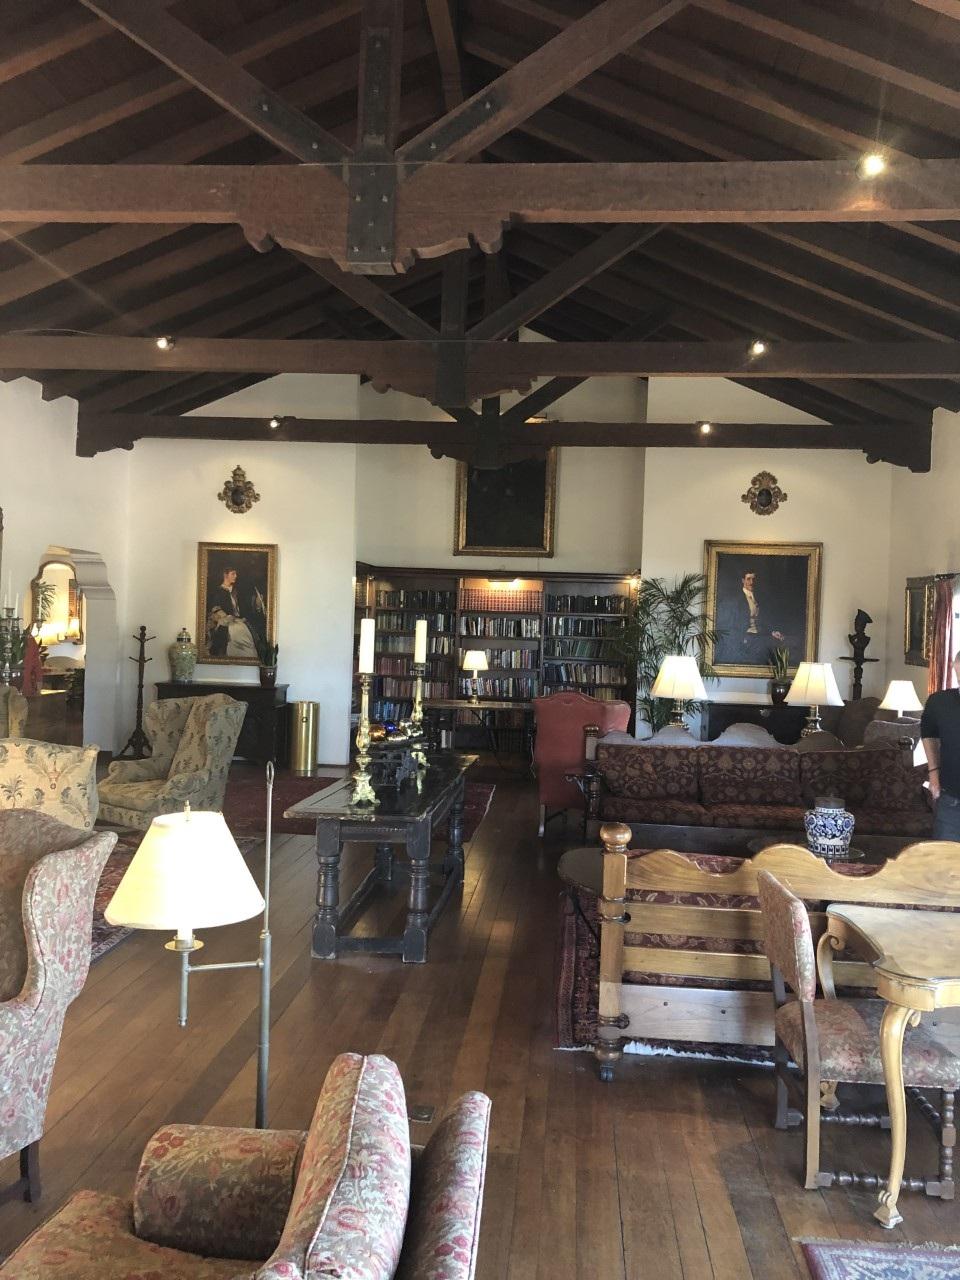 Inside the Arizona Inn